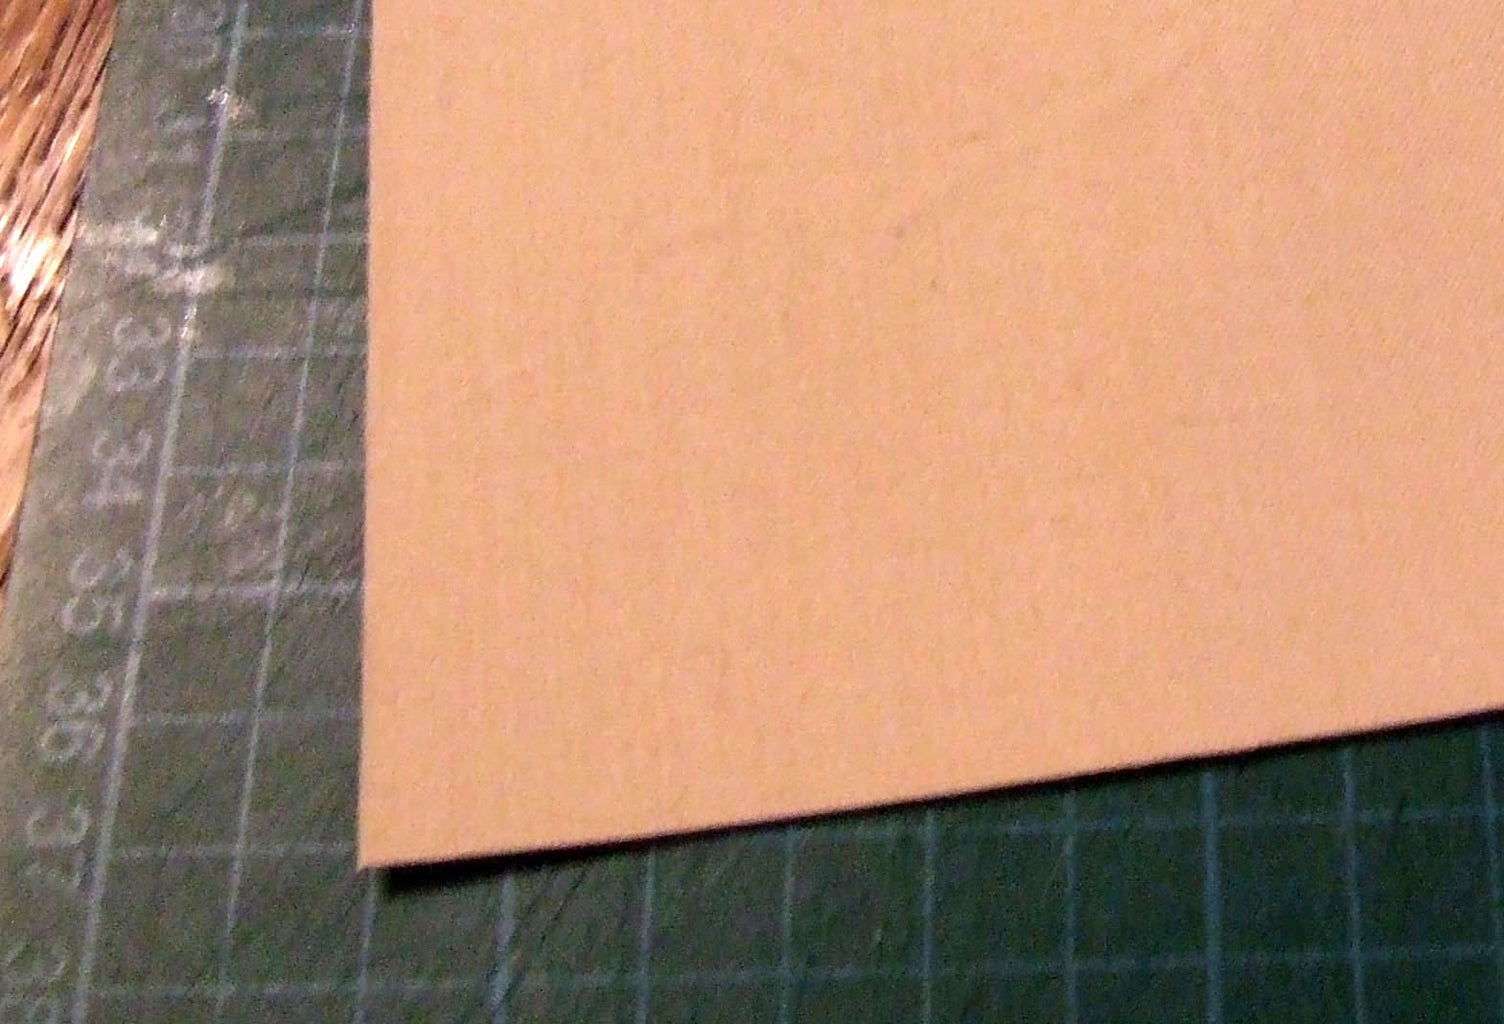 Inspect Fabric